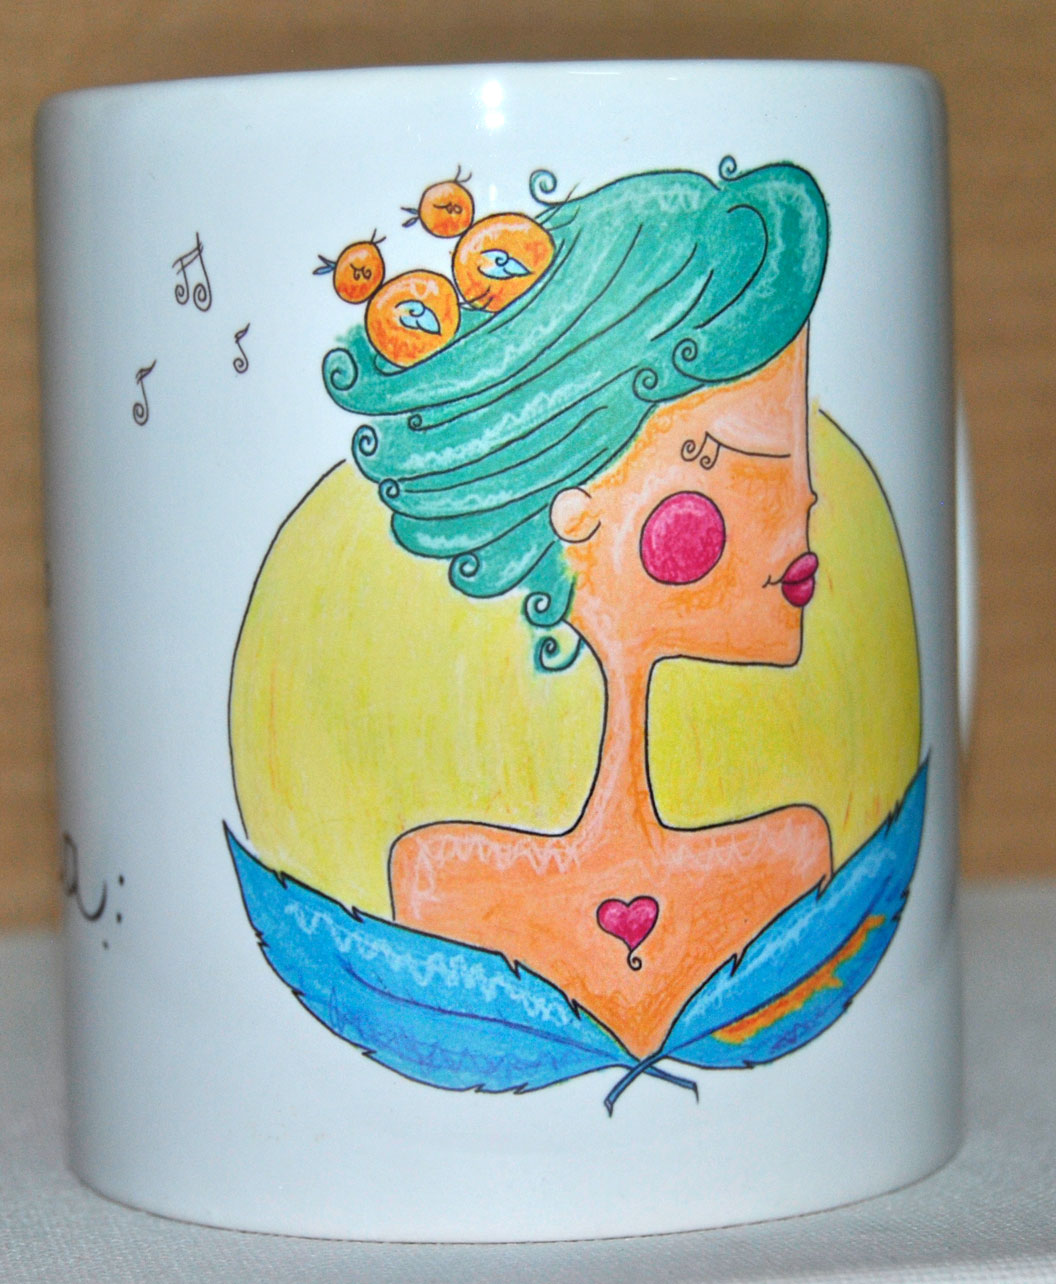 taza original diferente bonita ilustracion chica pajaros en la cabeza